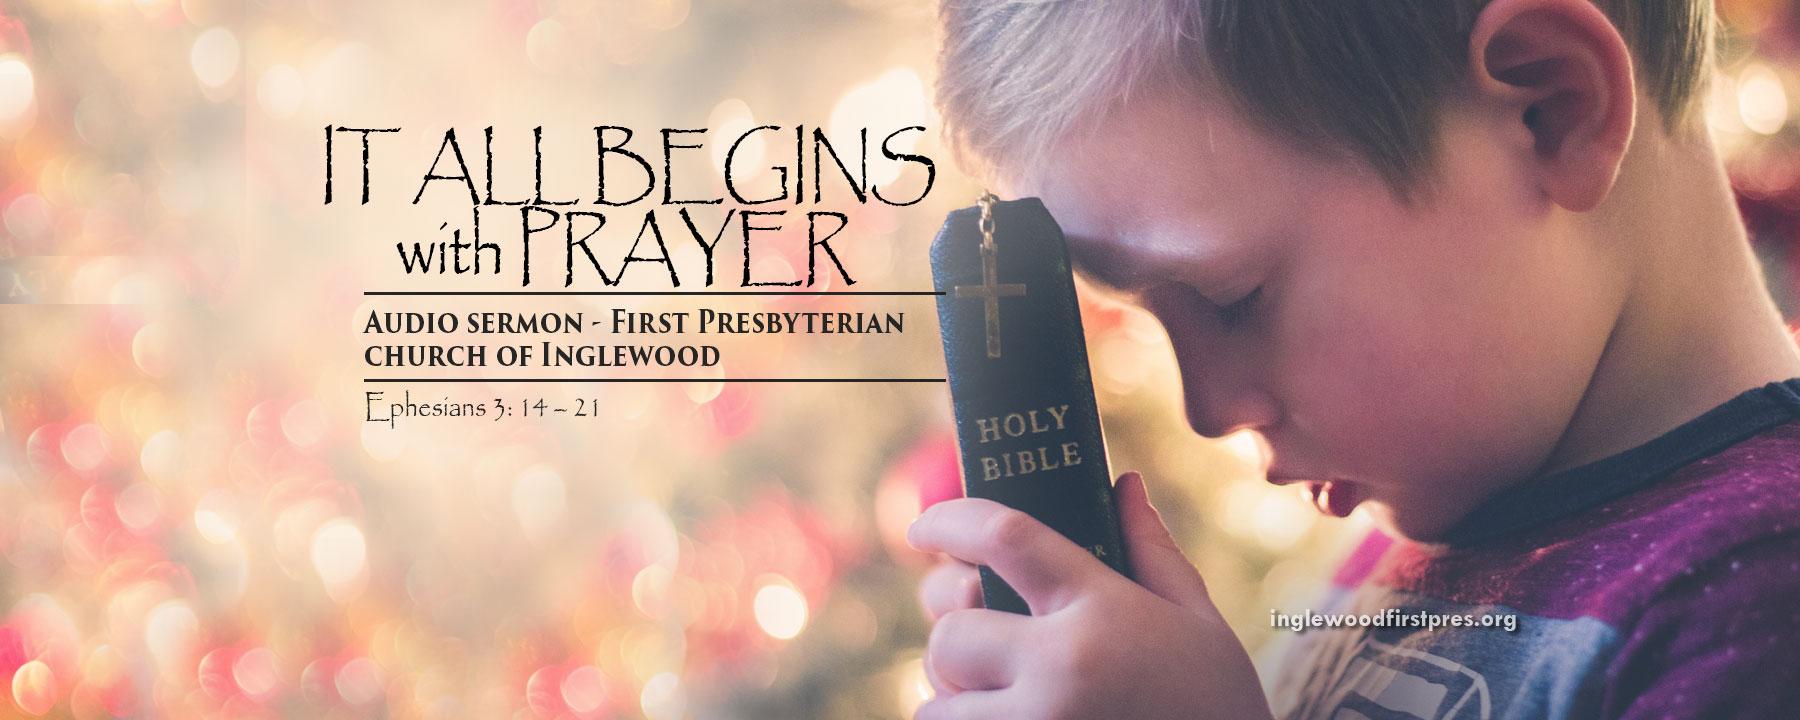 Audio Sermon - It All Begins with Prayer (Ephesians 3: 14 – 21)